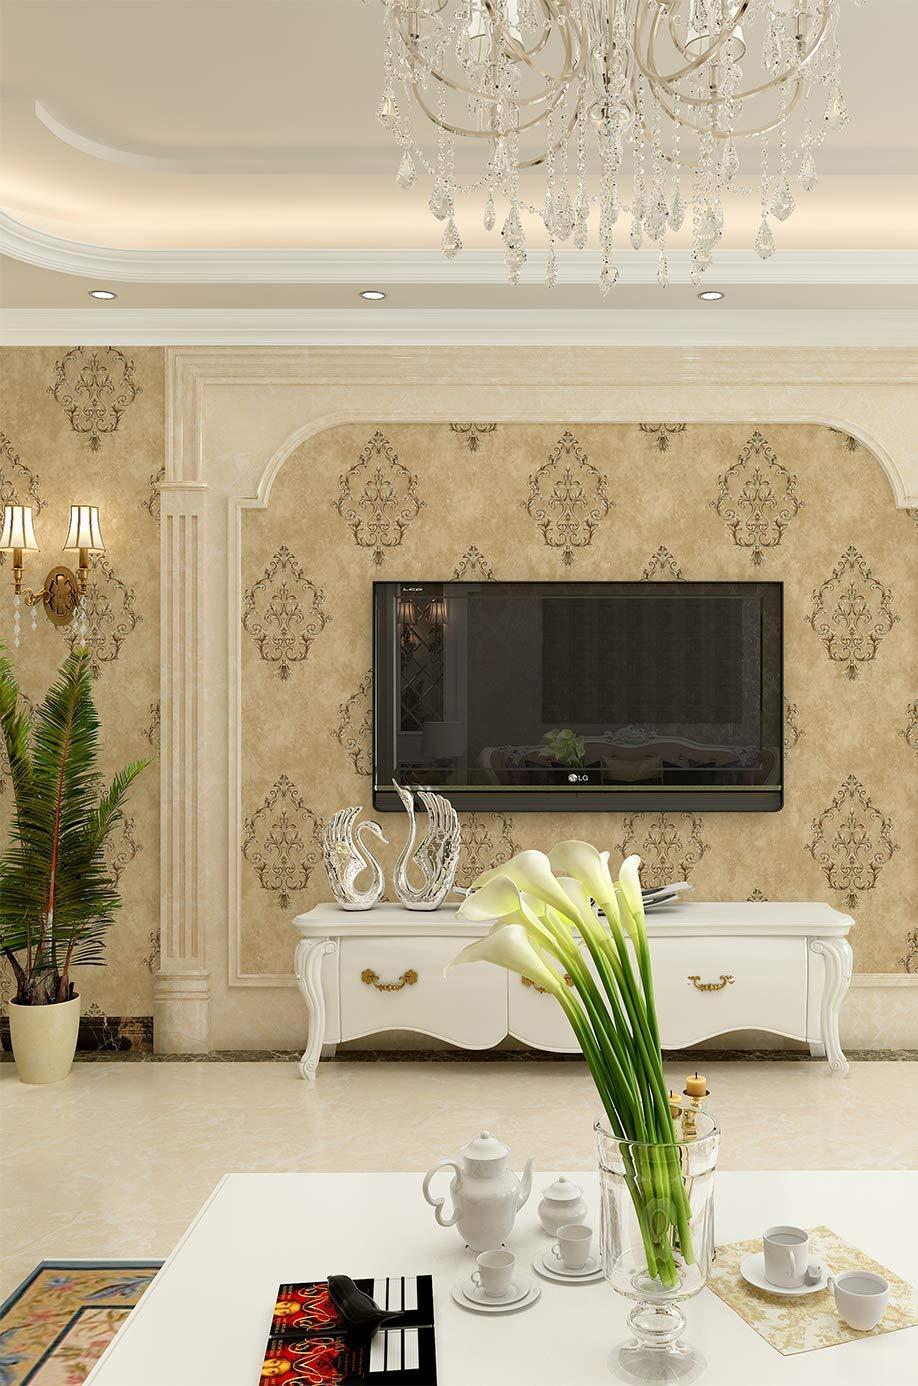 D Decor WallArt Designer Wallpaper for Home,Living Room, Bedroom